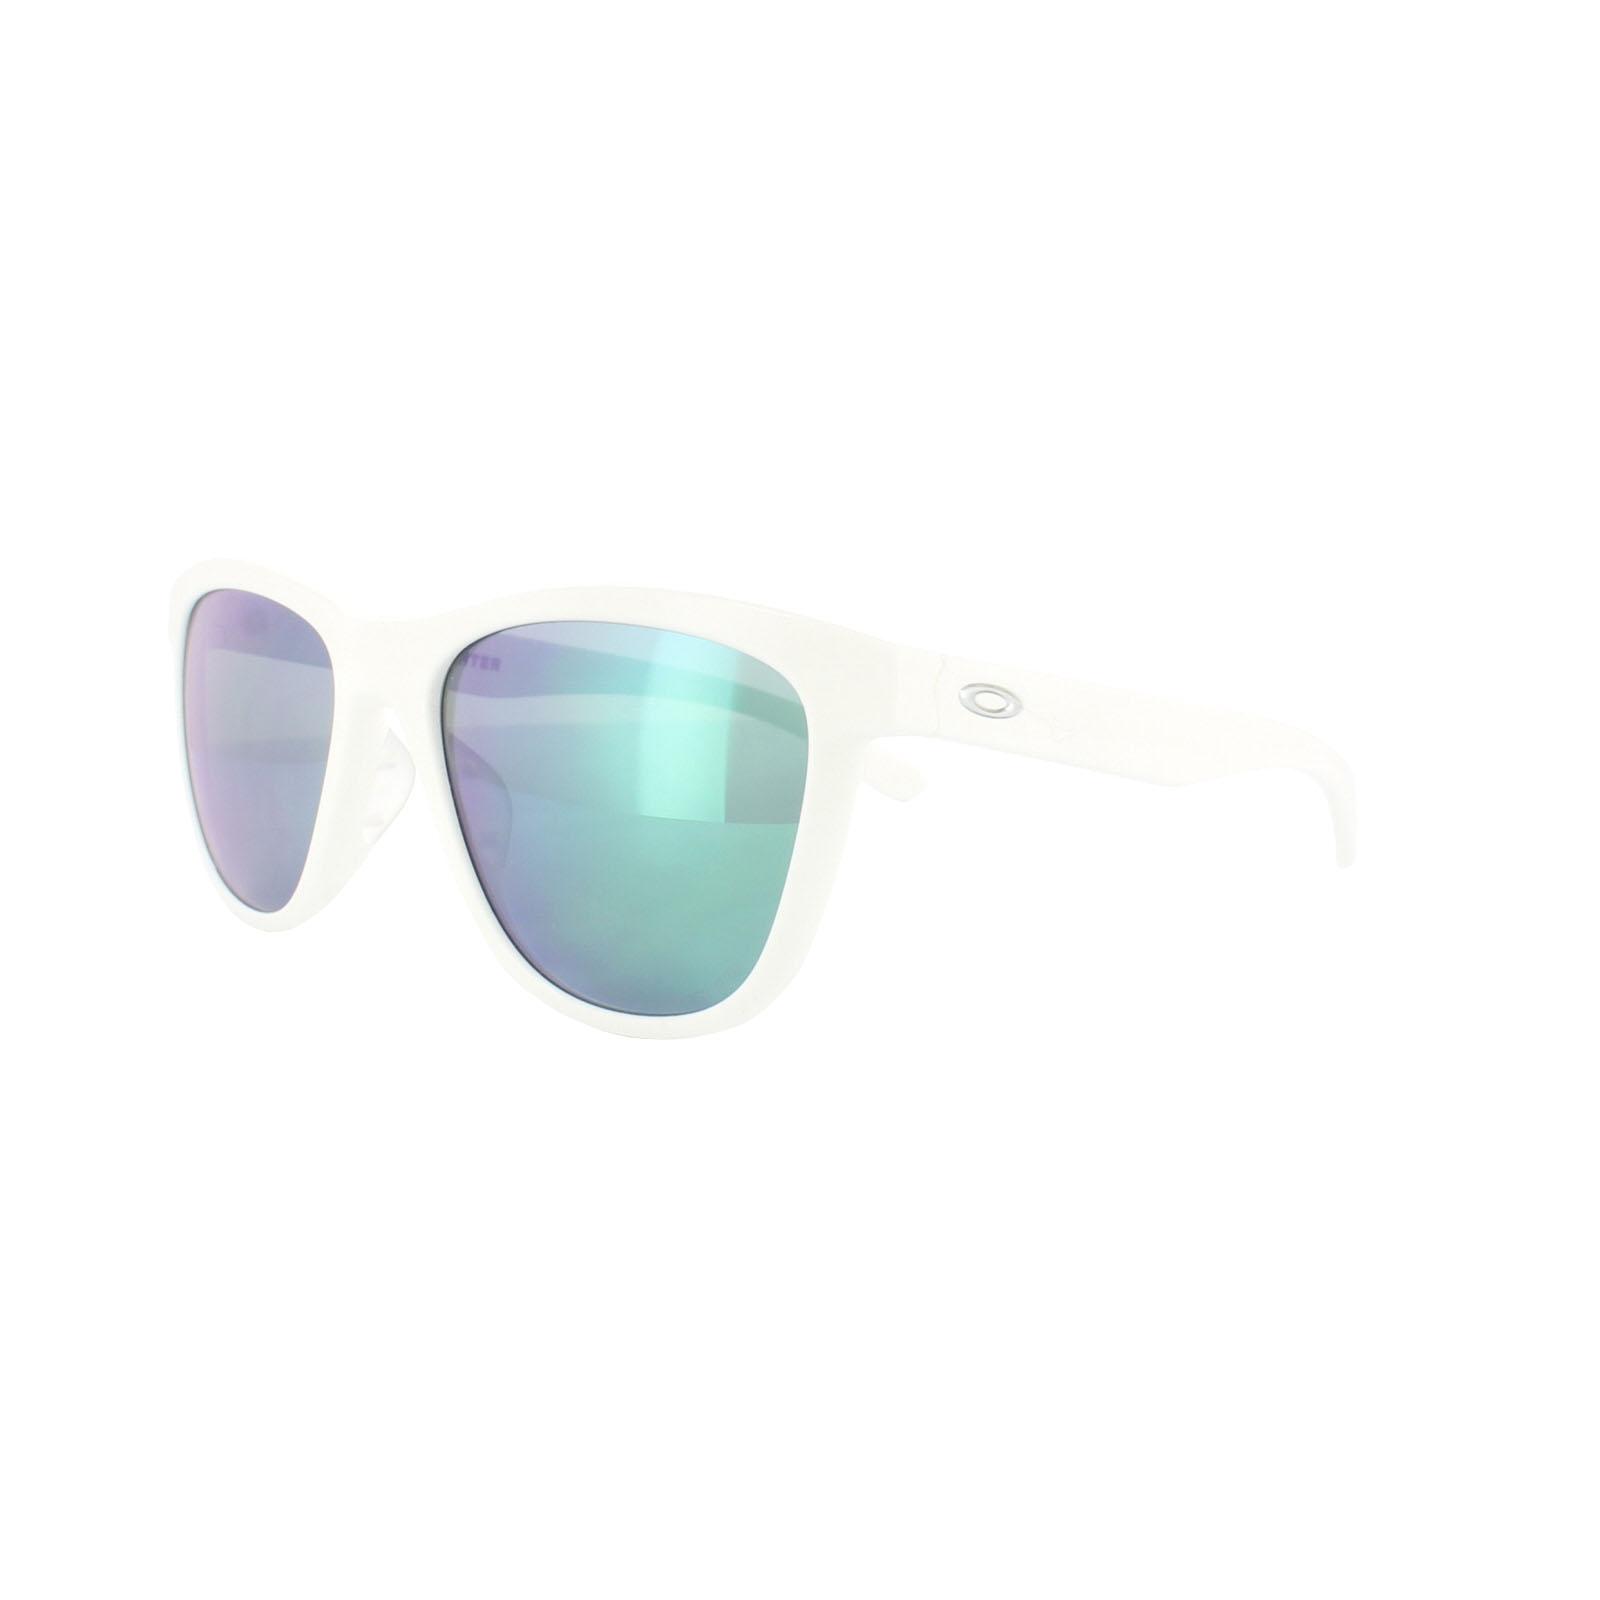 3f39001631 Sentinel Oakley Sunglasses Moonlighter OO9320-06 Polished White Jade  Iridium Polarized